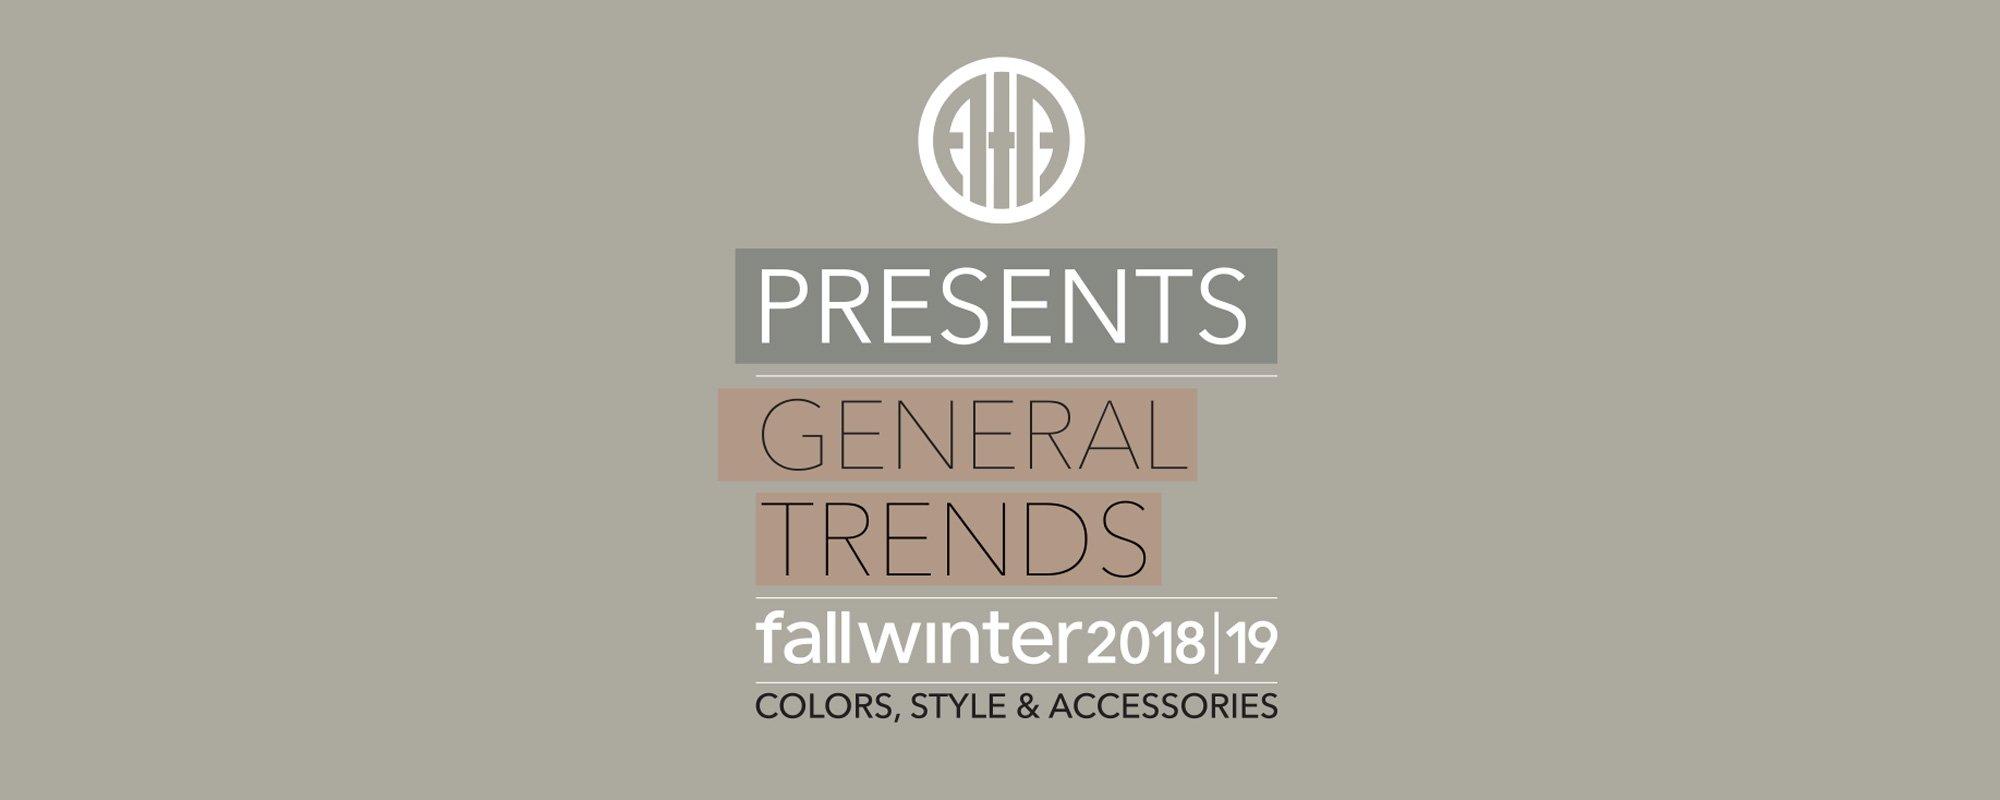 General-Trends-Fallwinter2018.19-3_2